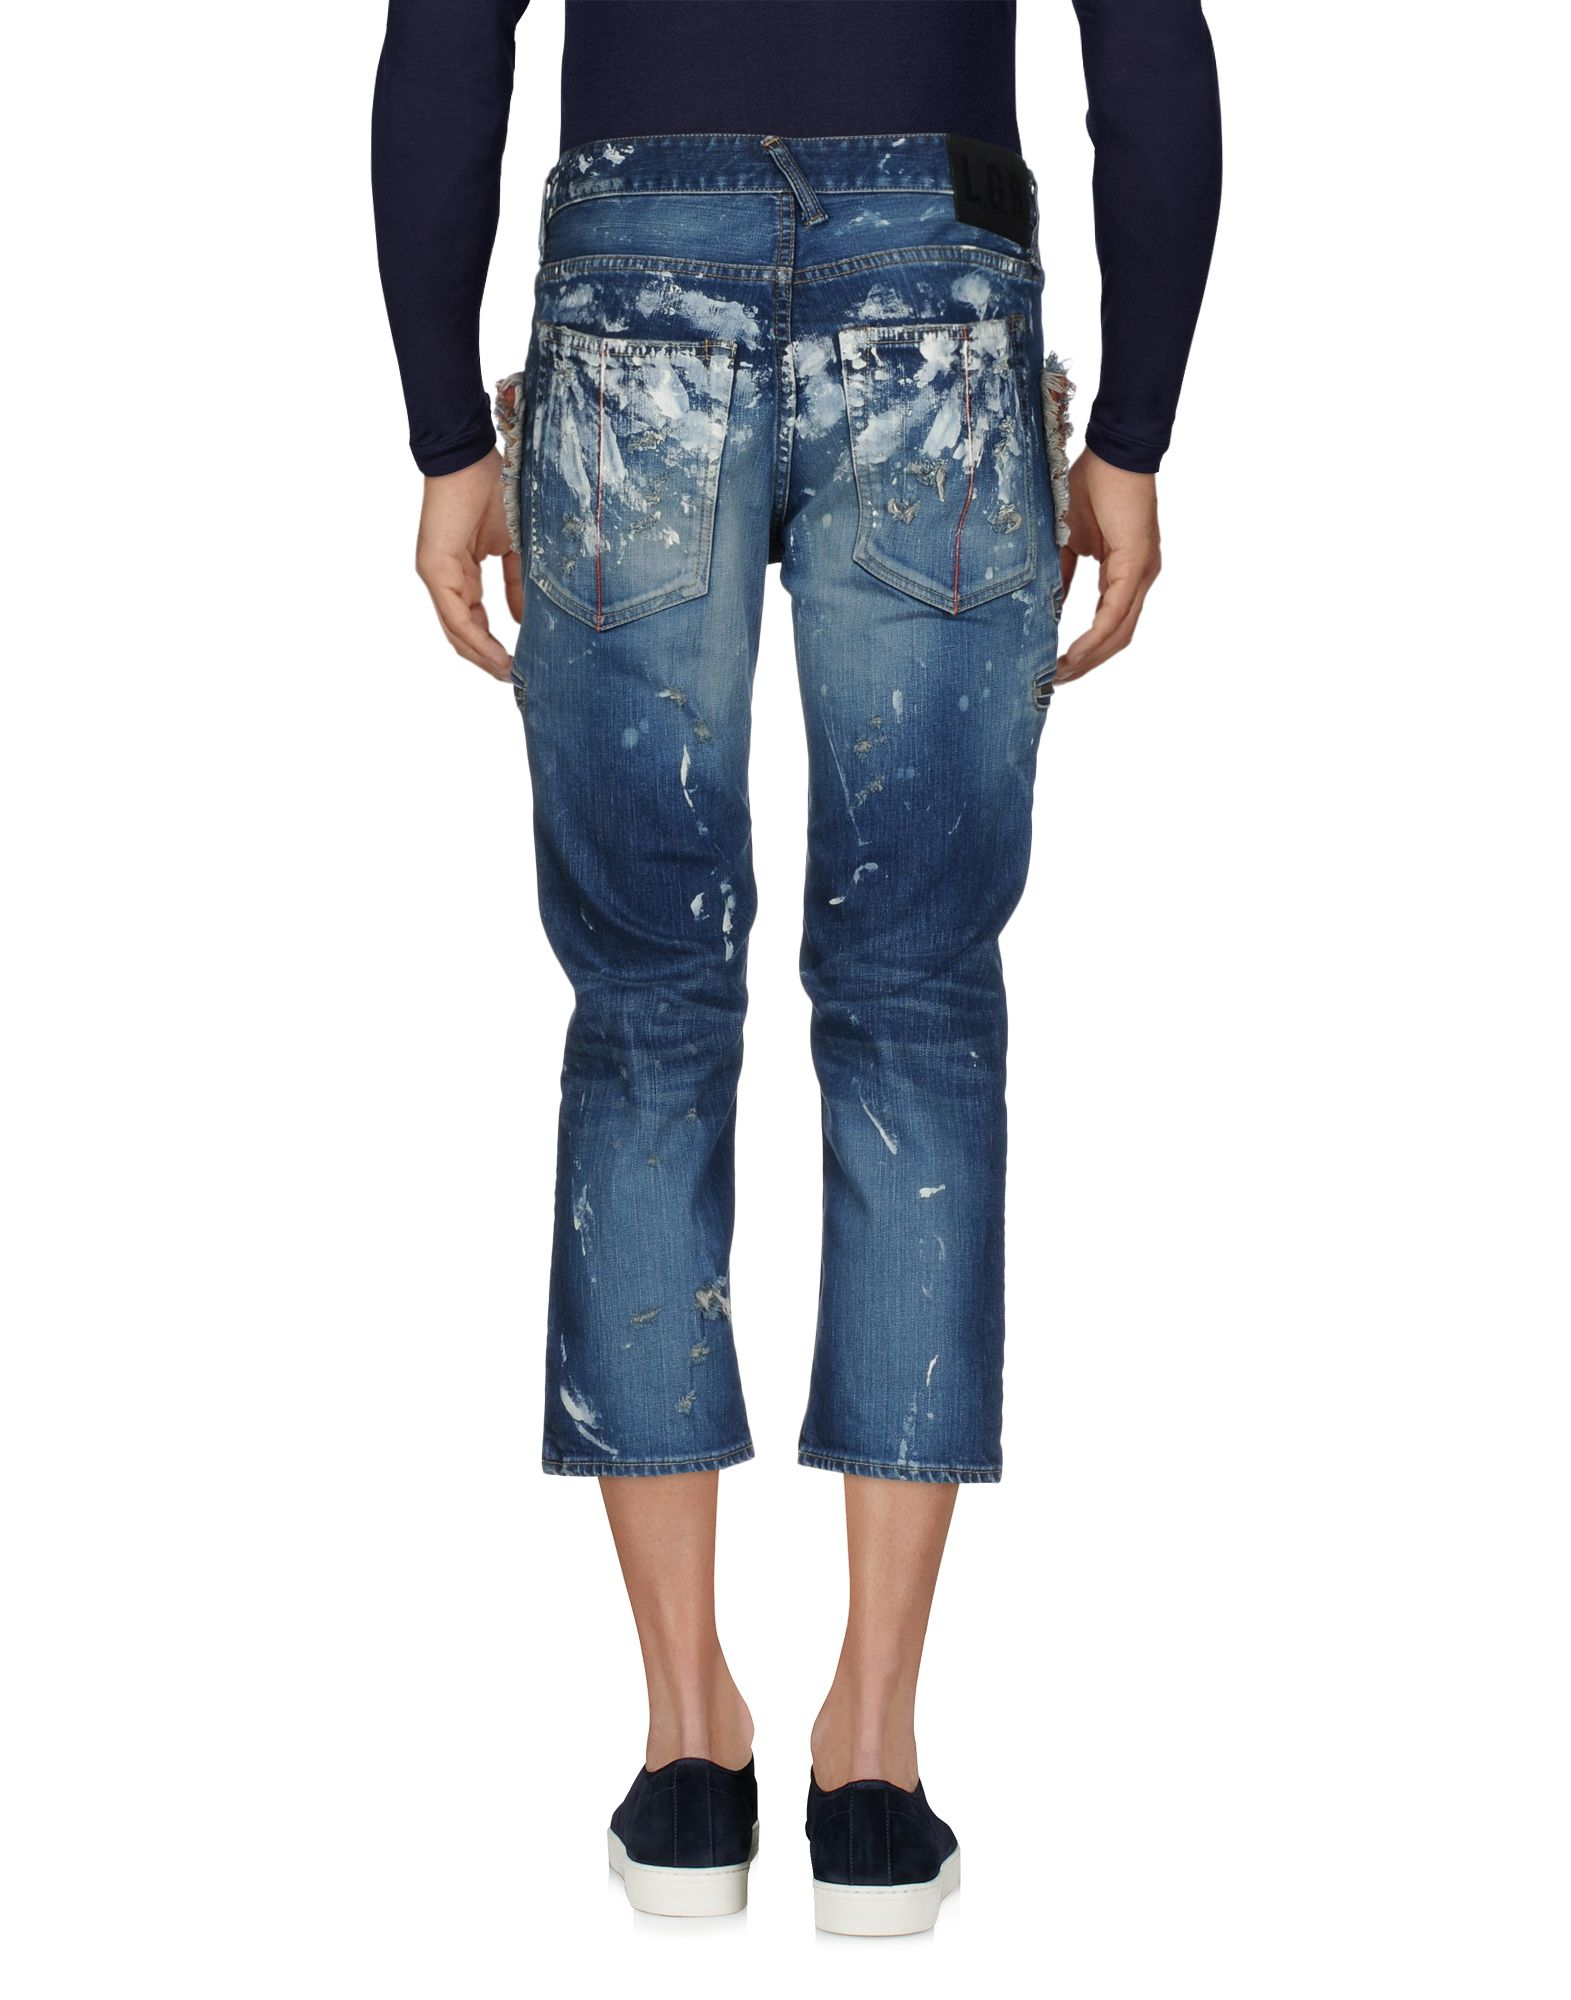 Pantaloni Jeans L.G.B. Uomo - 42666197HM 42666197HM - d8d7b3